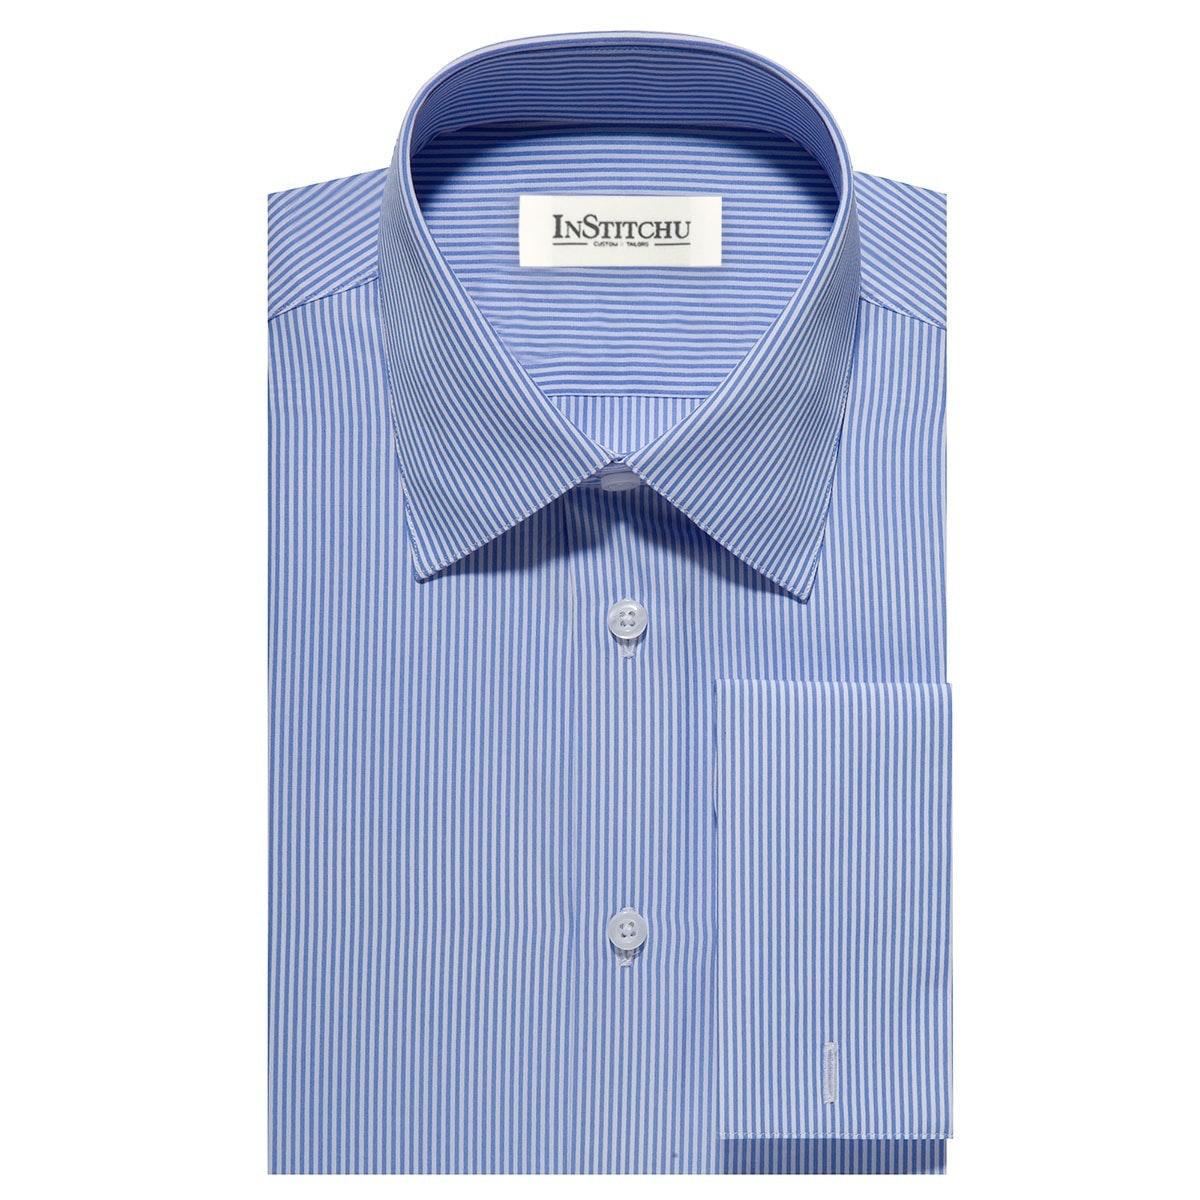 InStitchu Collection The Southwick Blue Pinstripe Shirt